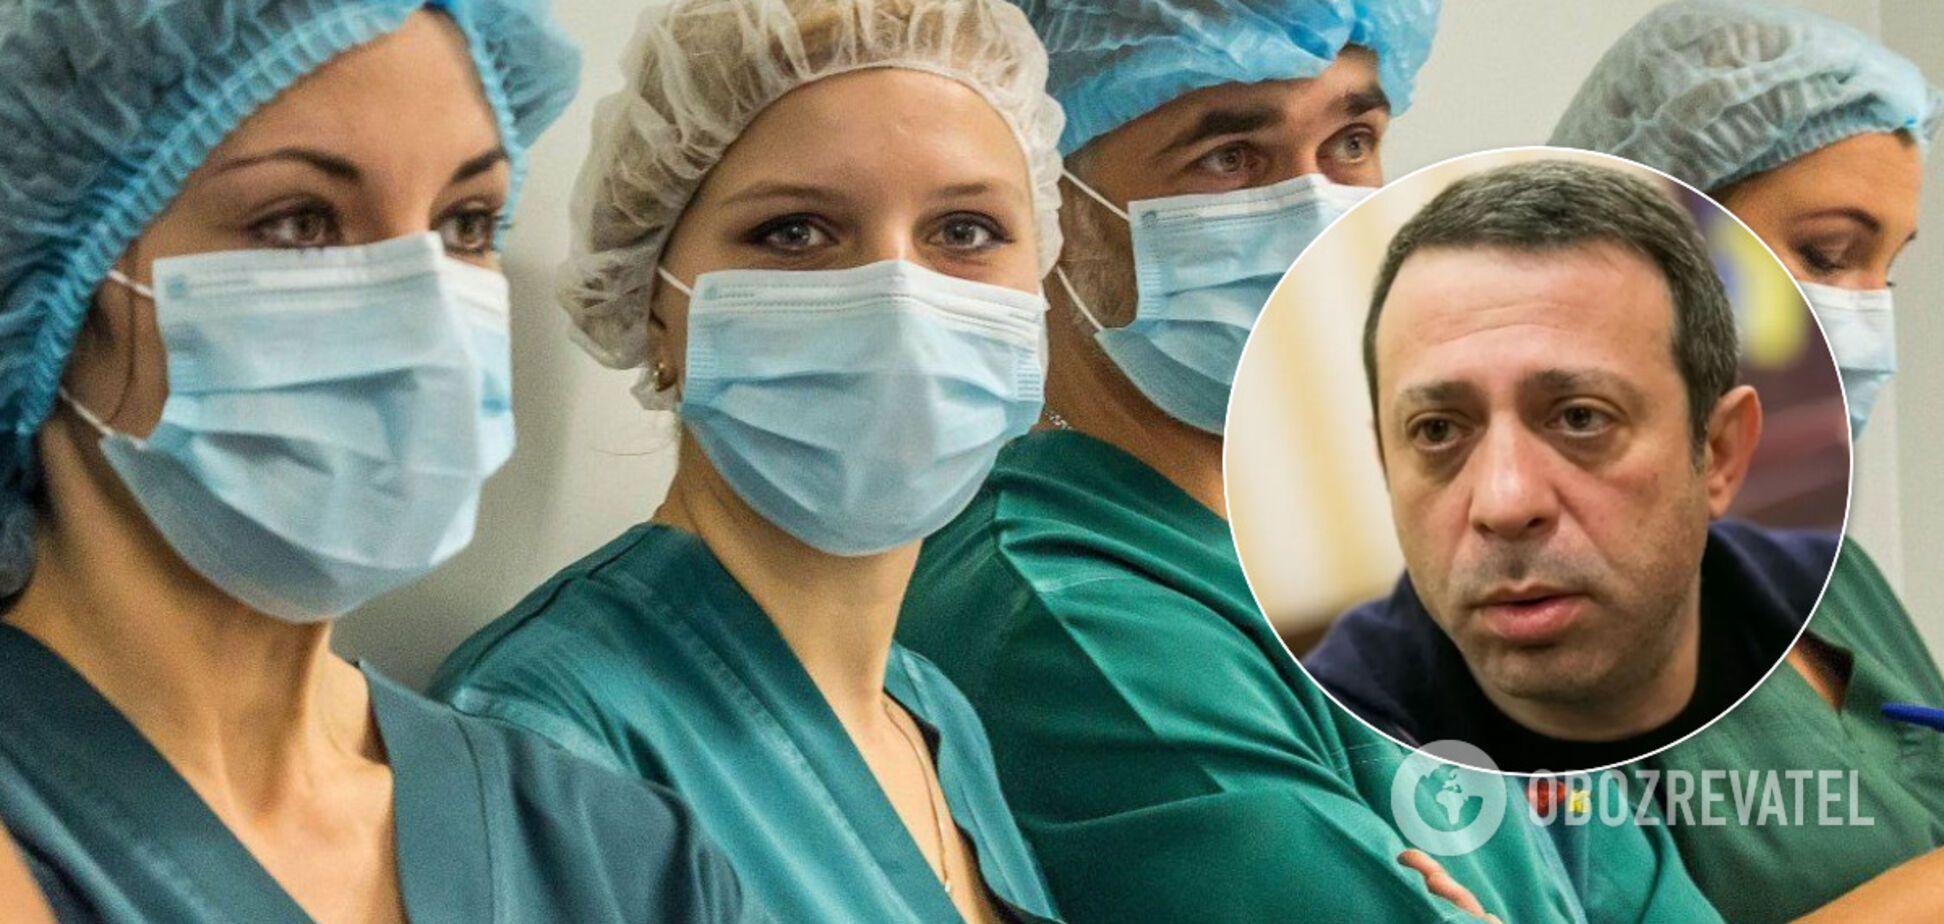 Медики Днепропетровщины недополучили 270 млн грн из госбюджета – Корбан